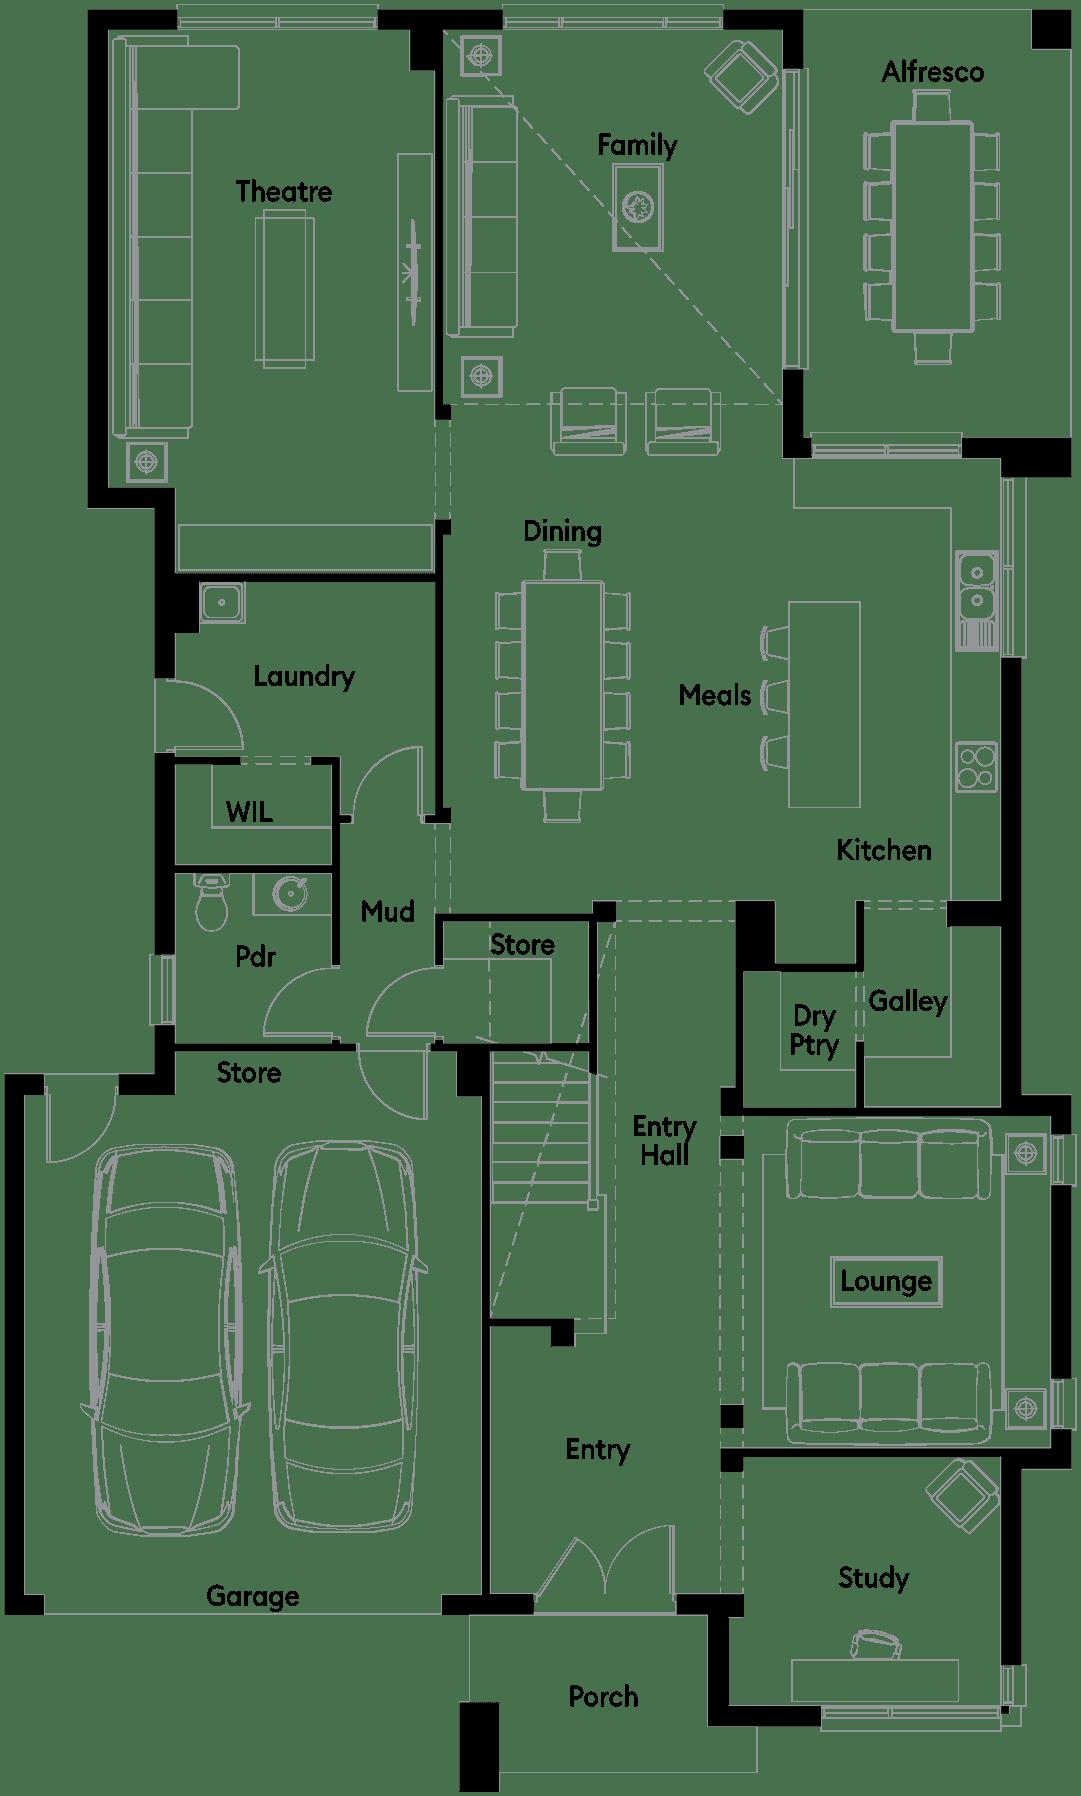 FloorPlan1_HOUSE847_Astor-Grange_46-01